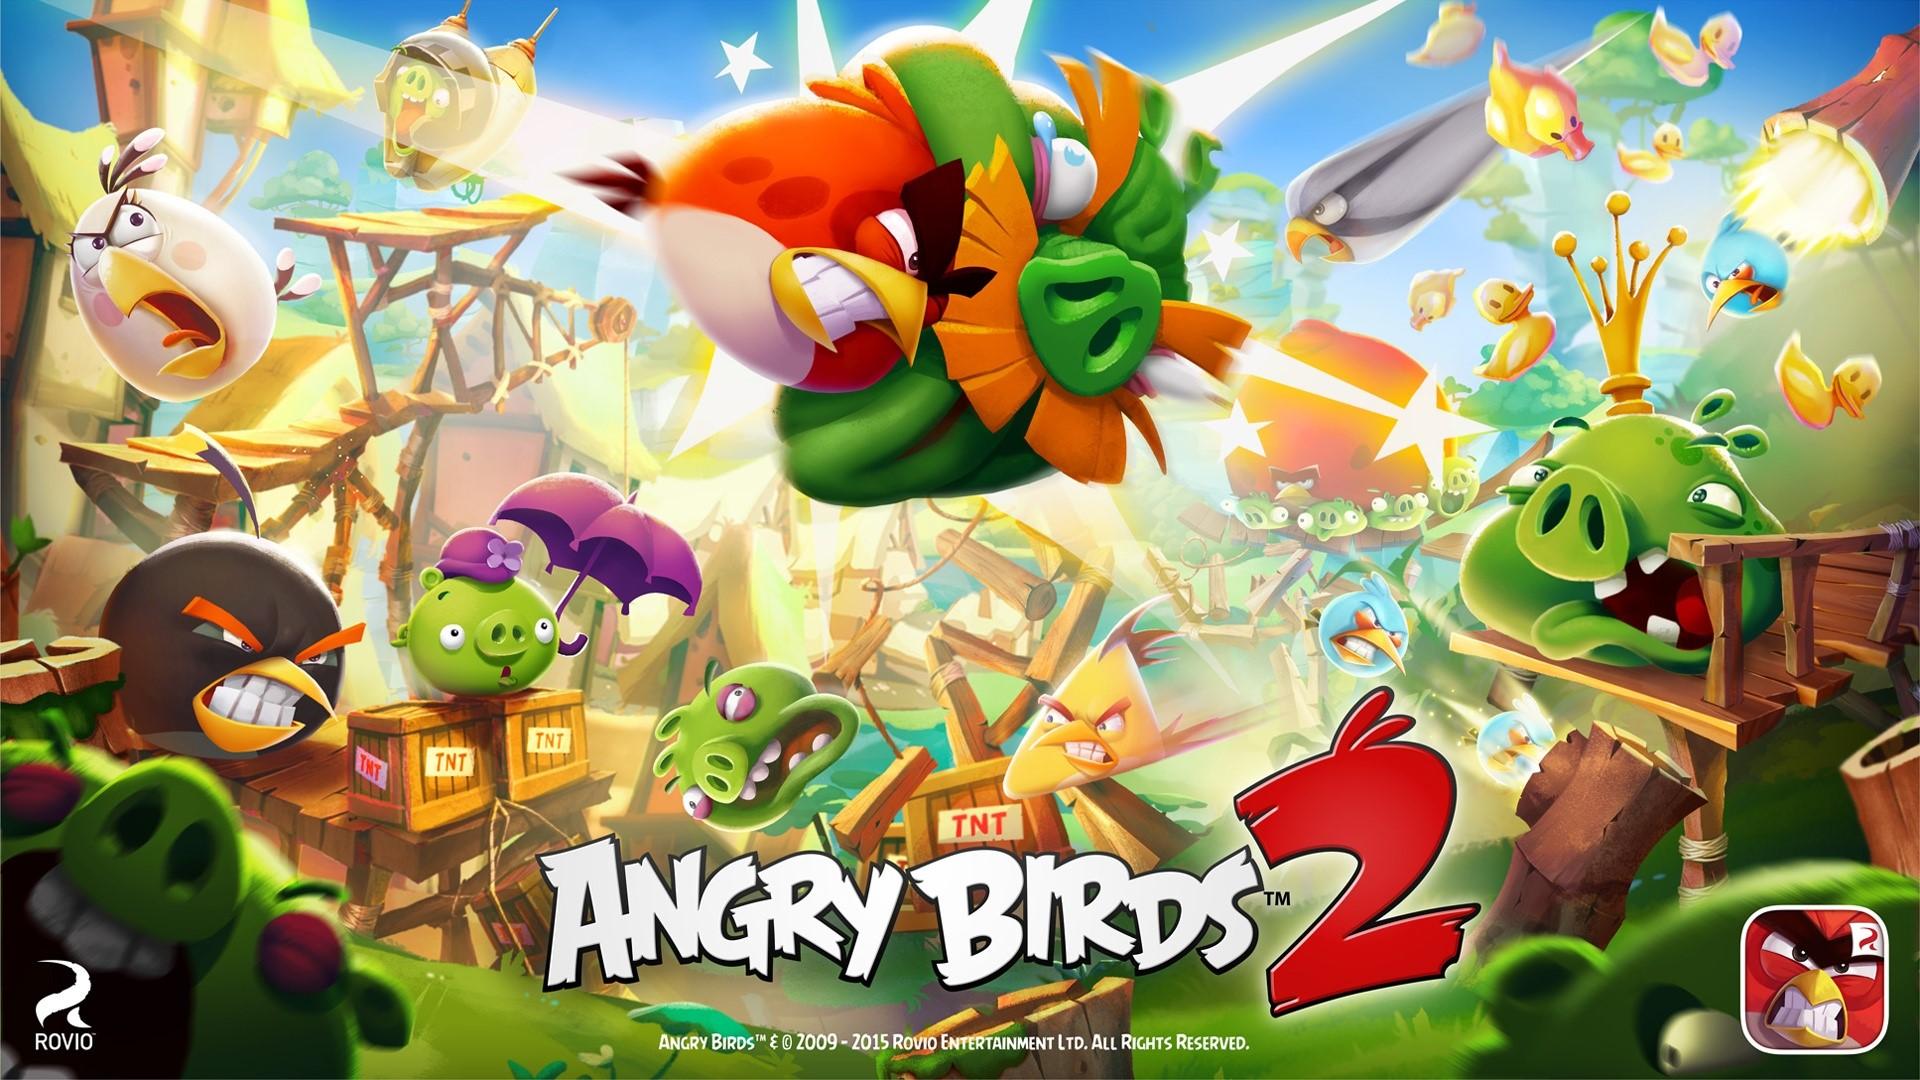 Fondos de pantalla Personajes de Angry Birds 2